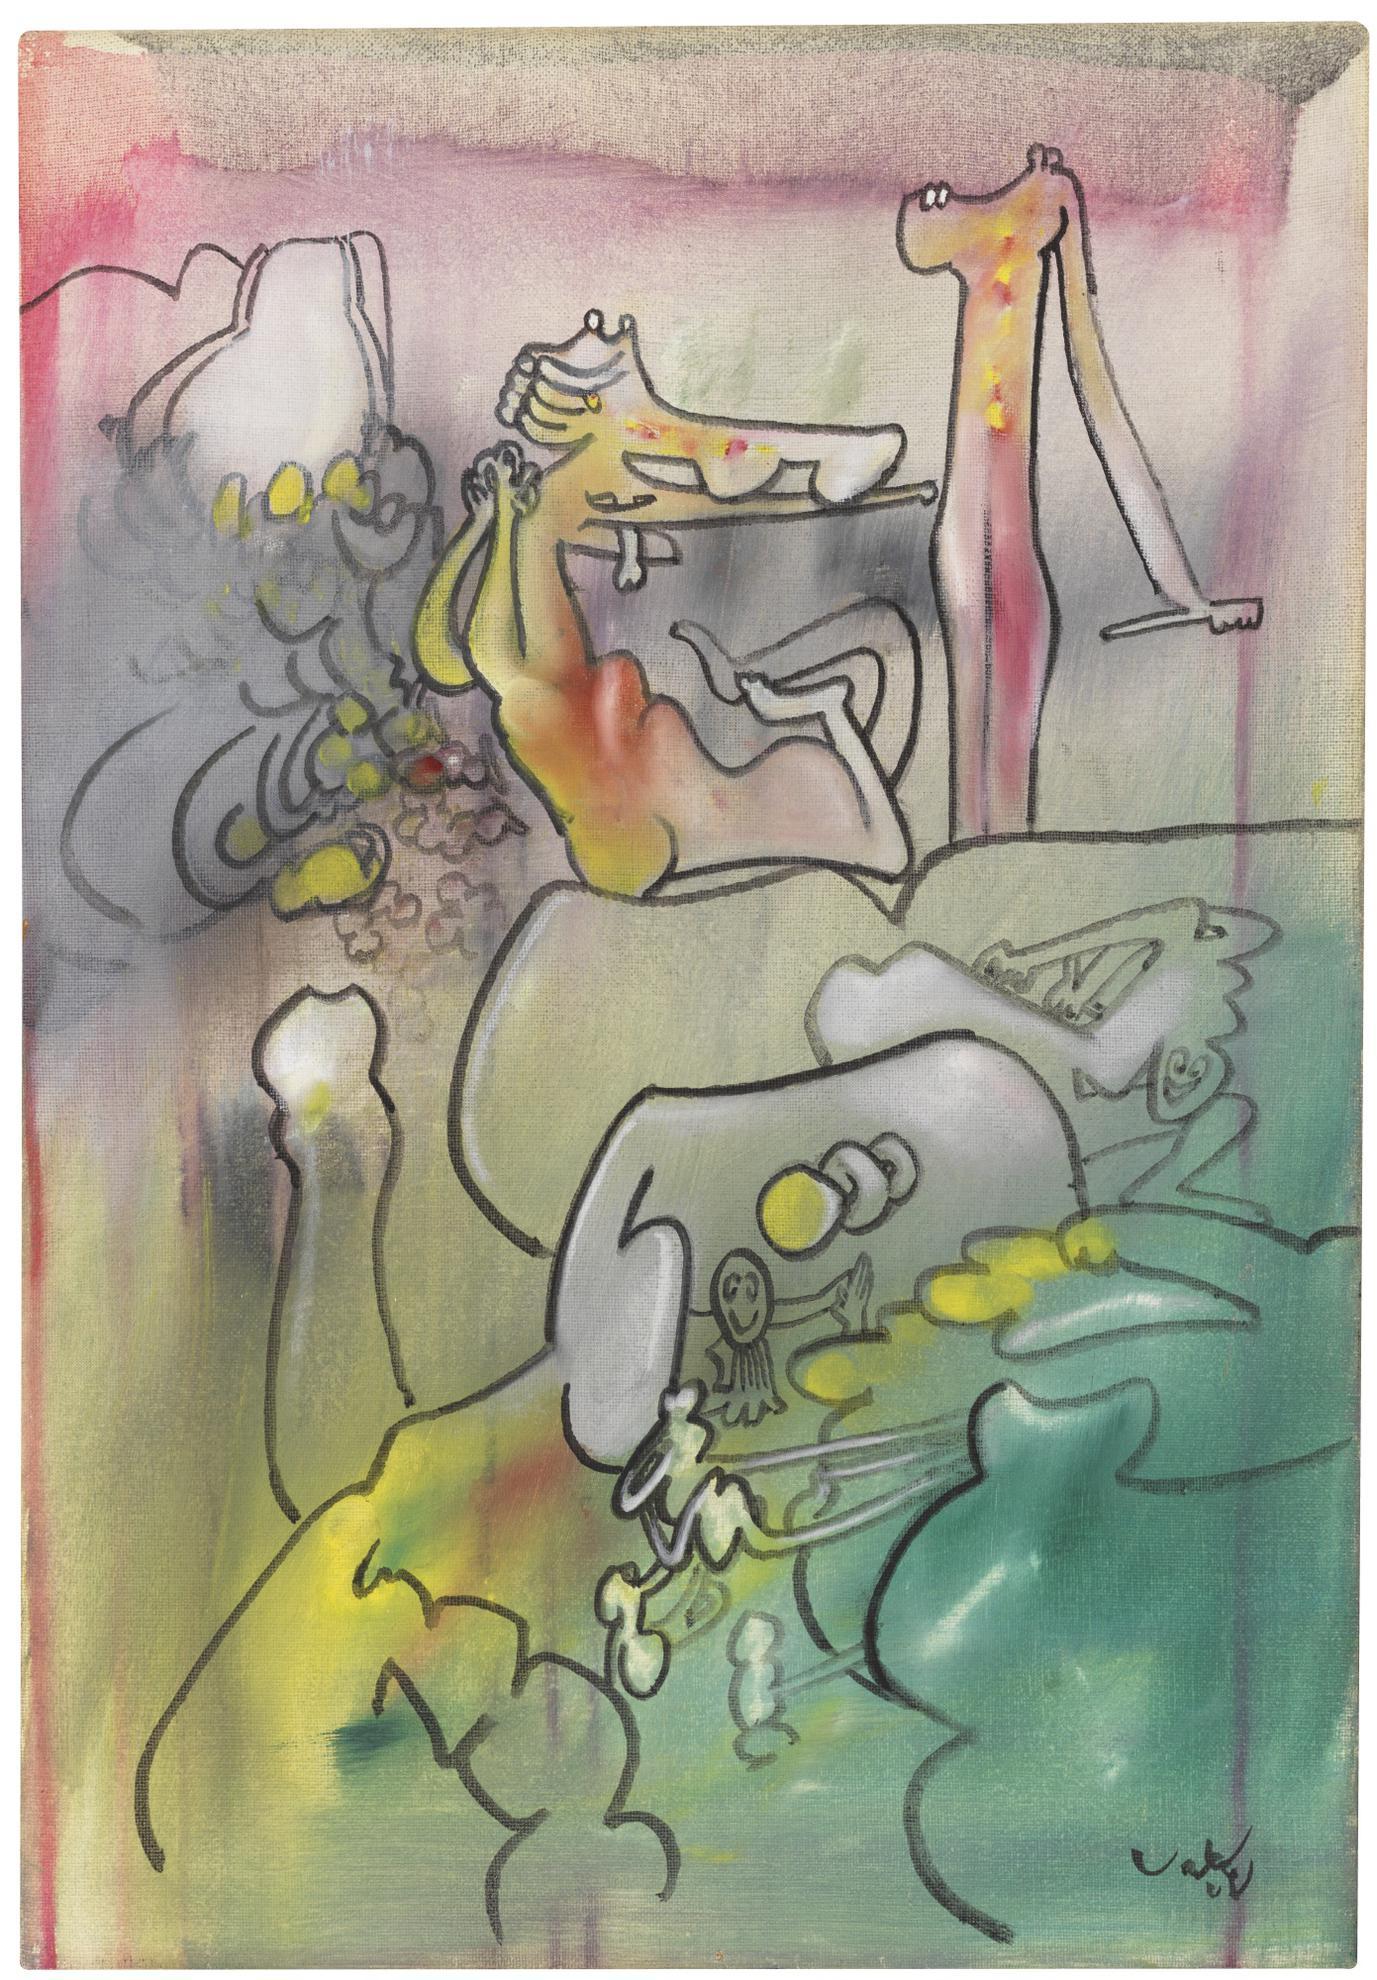 Roberto Matta-Programame Mucho-1971